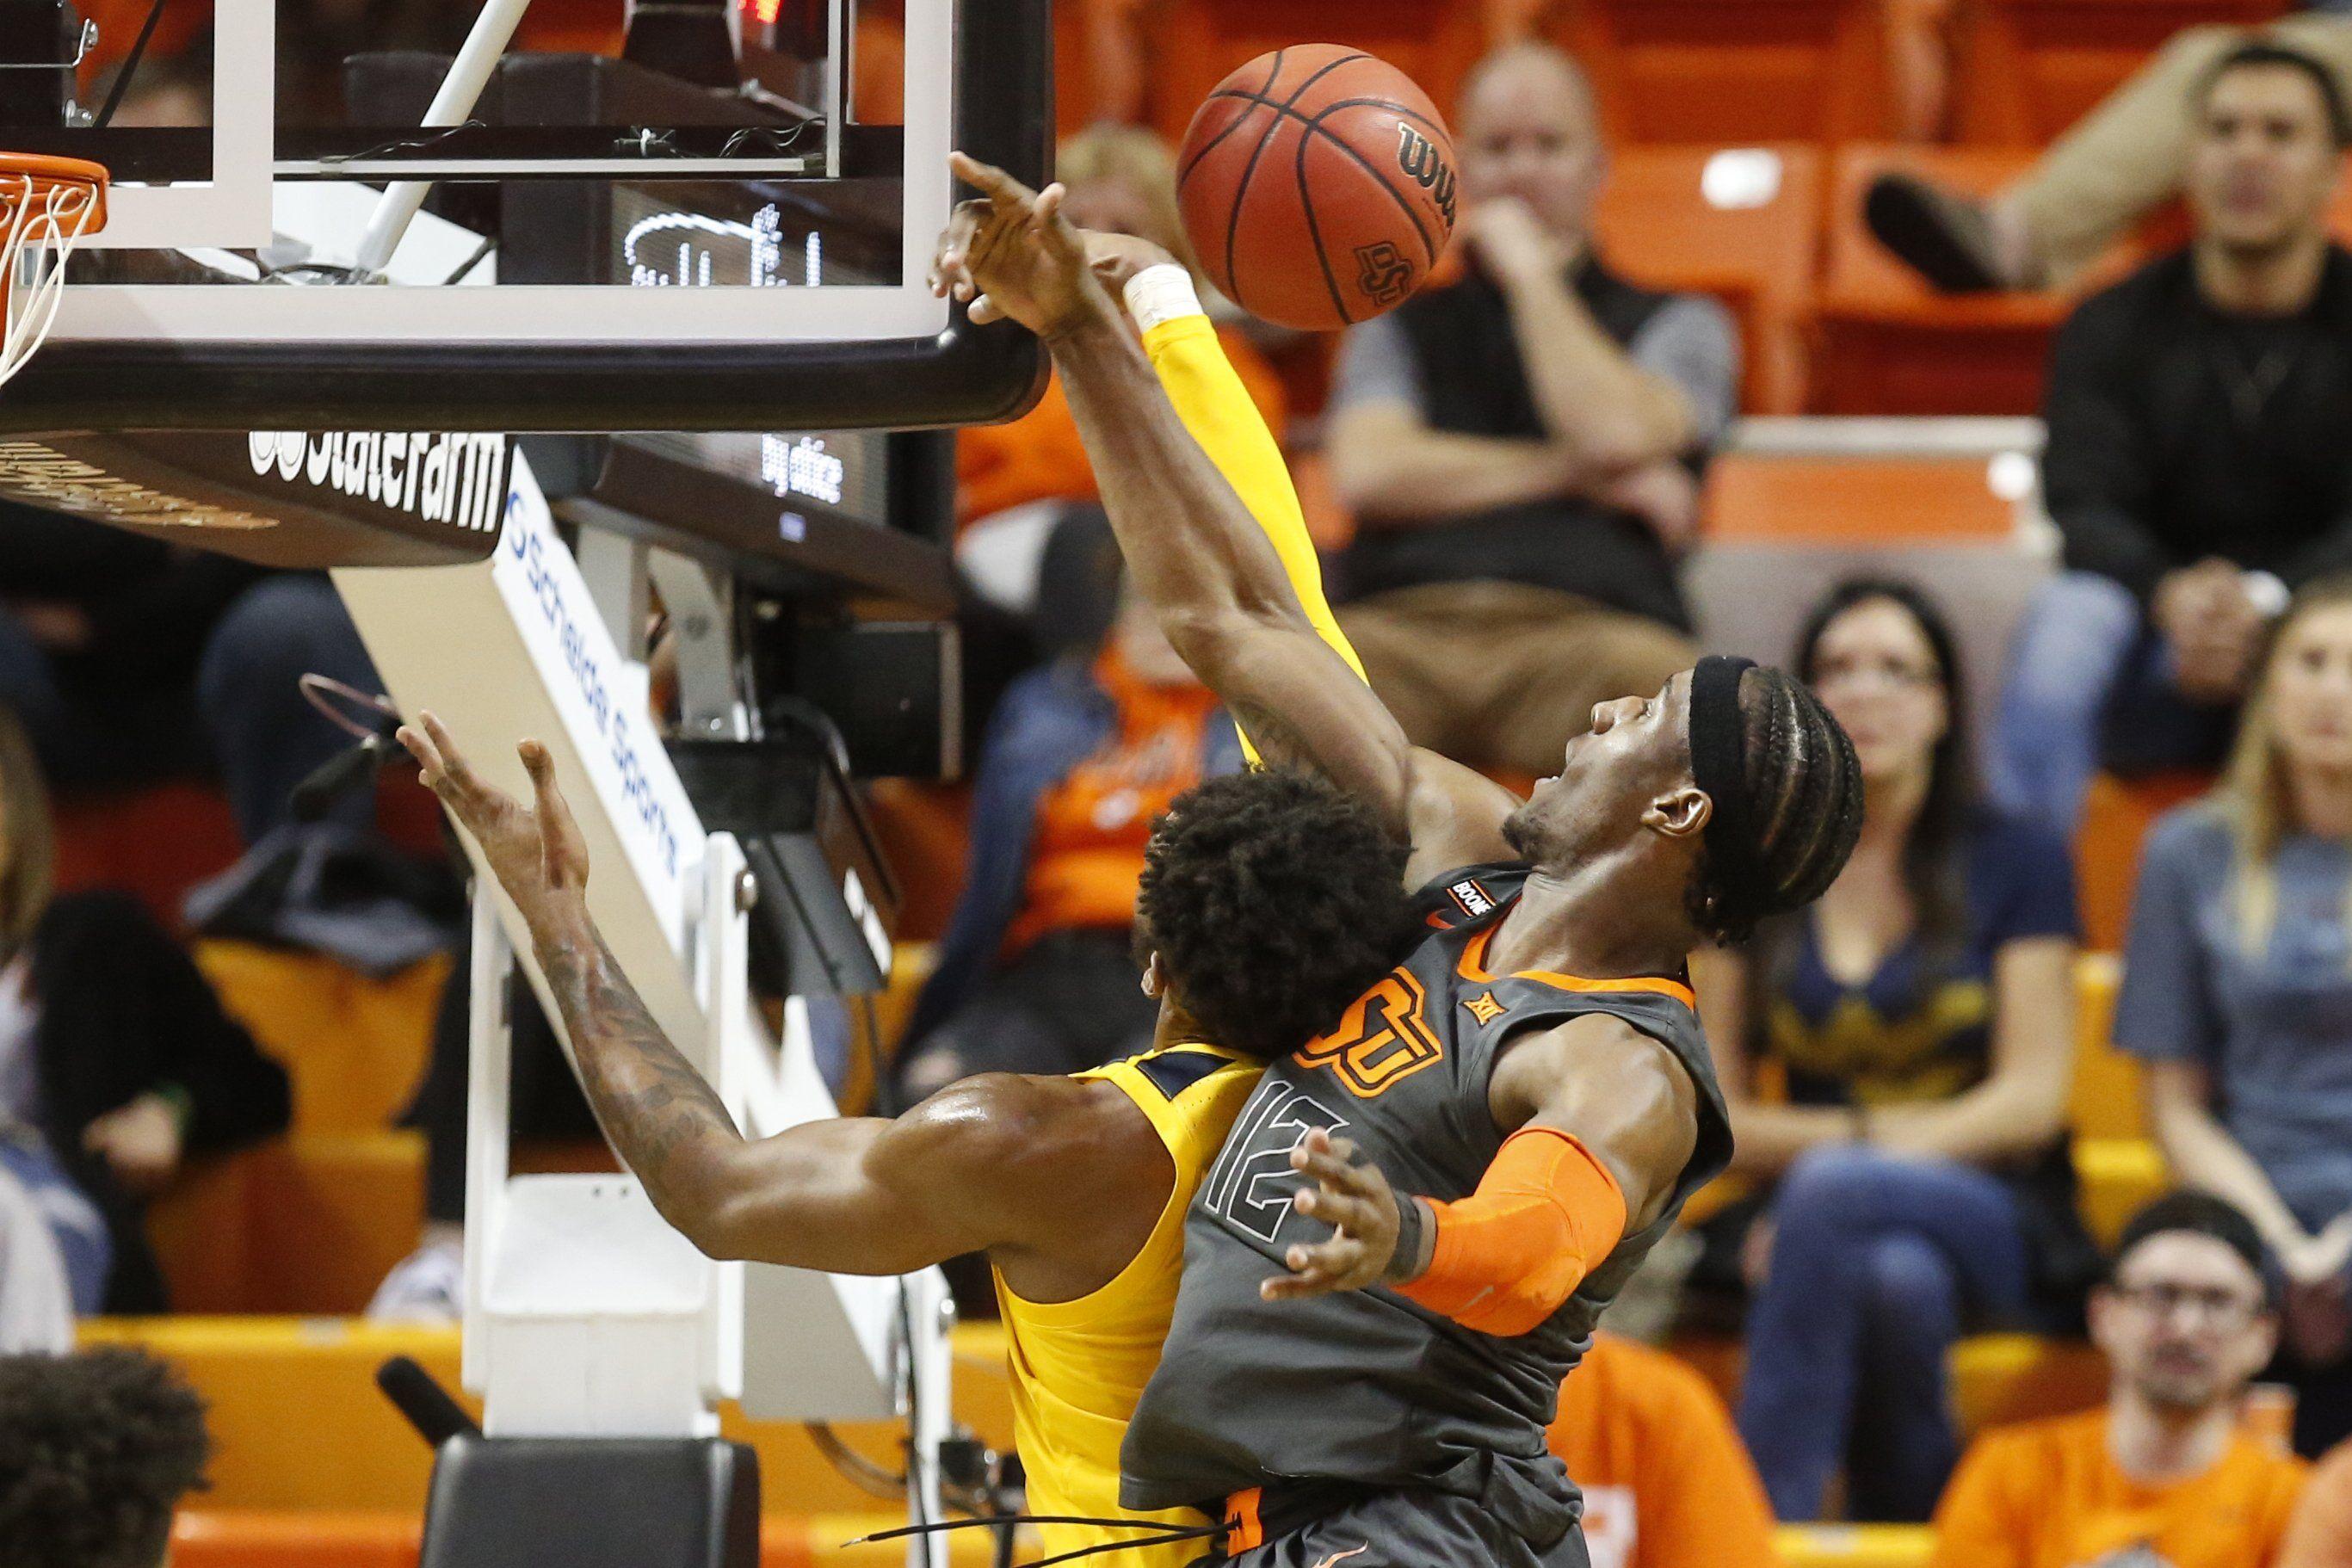 Balanced scoring, stifling defense lead WV over Okla. St